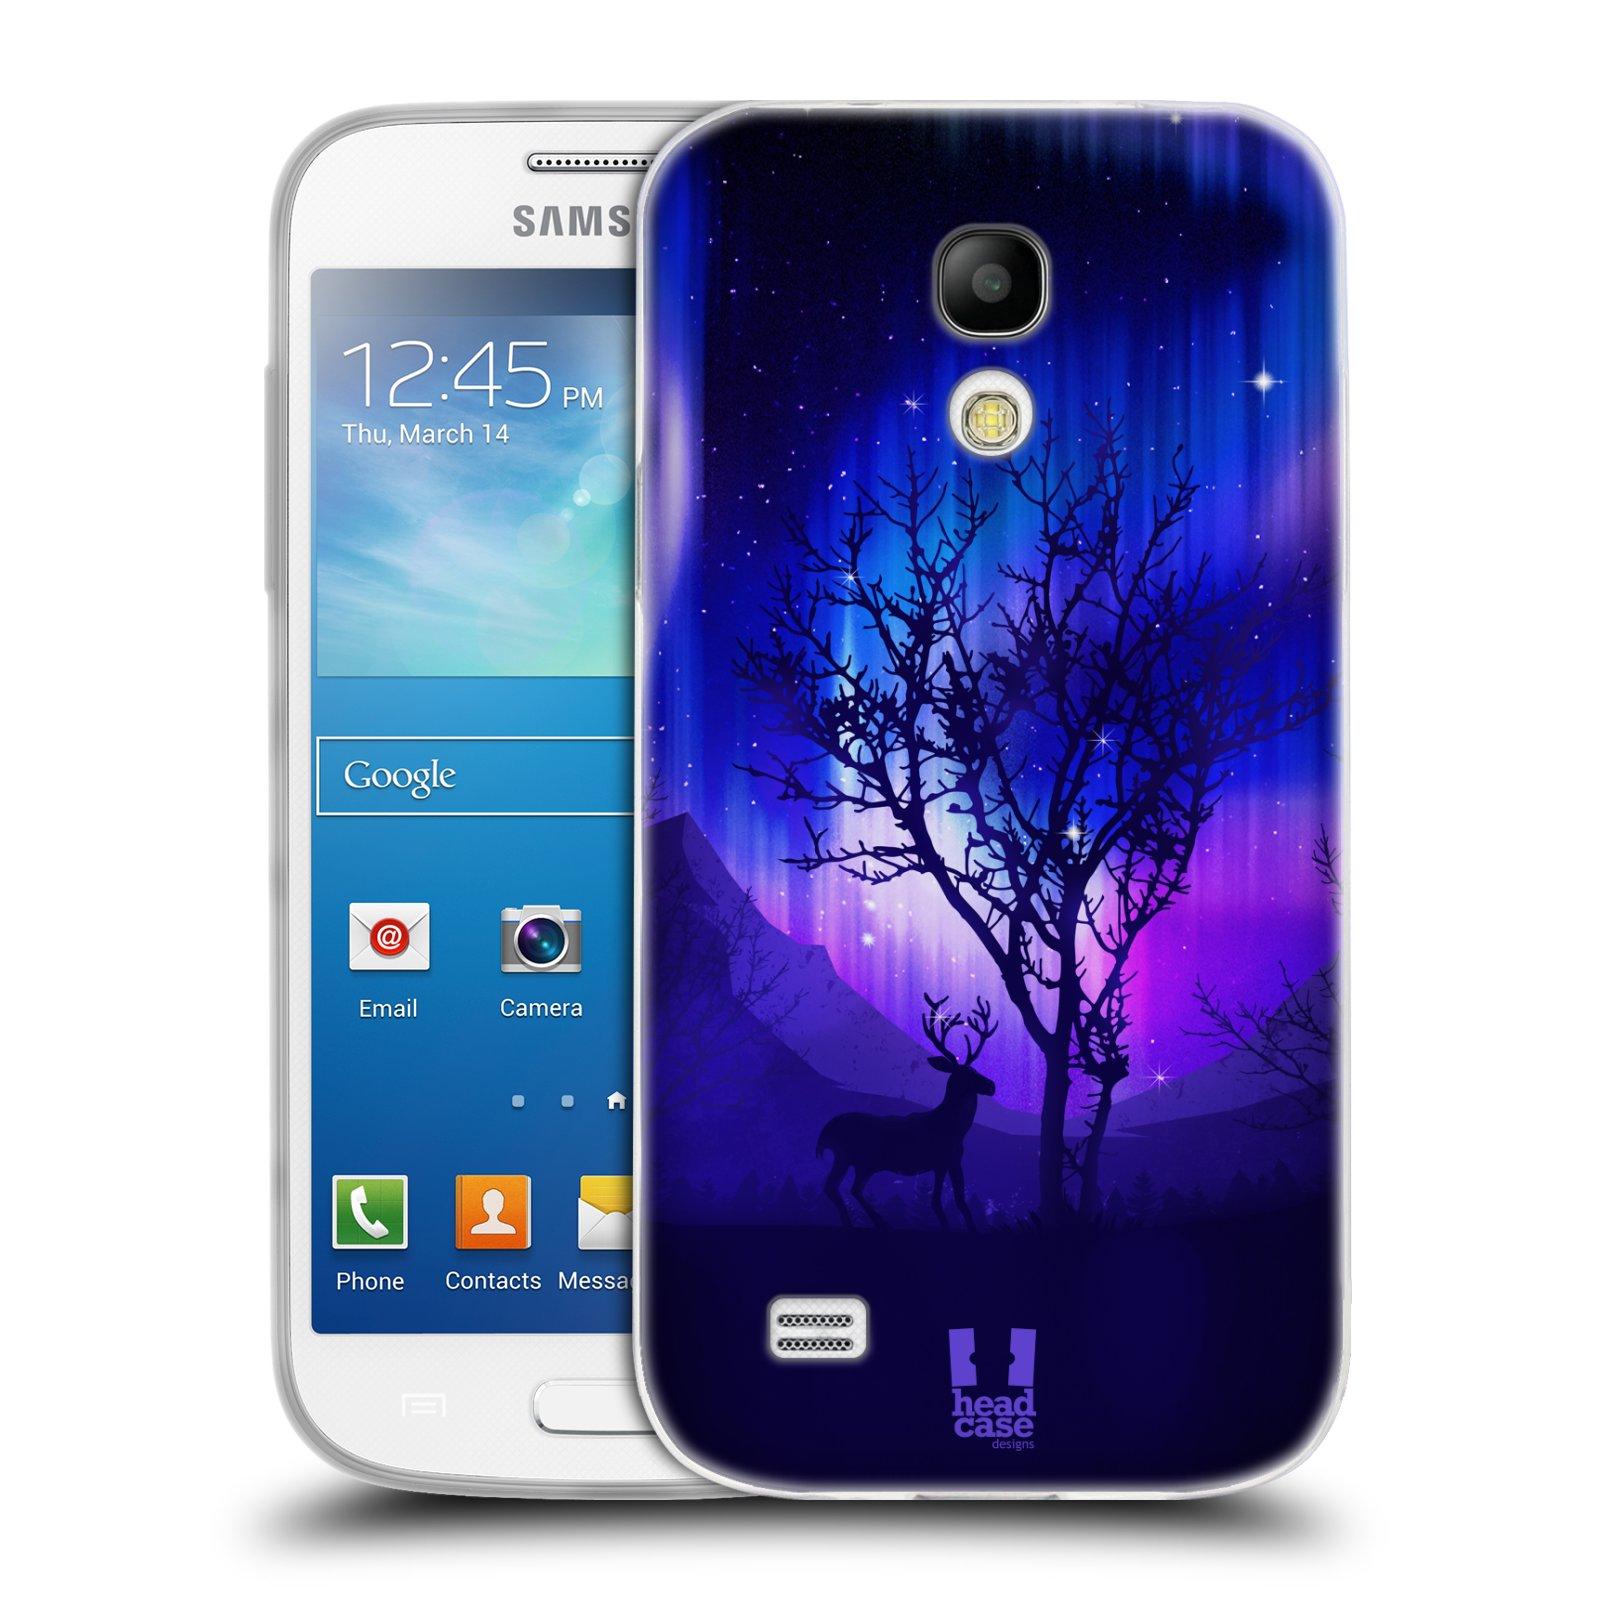 Silikonové pouzdro na mobil Samsung Galaxy S4 Mini HEAD CASE Polární Záře Strom (Silikonový kryt či obal na mobilní telefon Samsung Galaxy S4 Mini GT-i9195 / i9190)